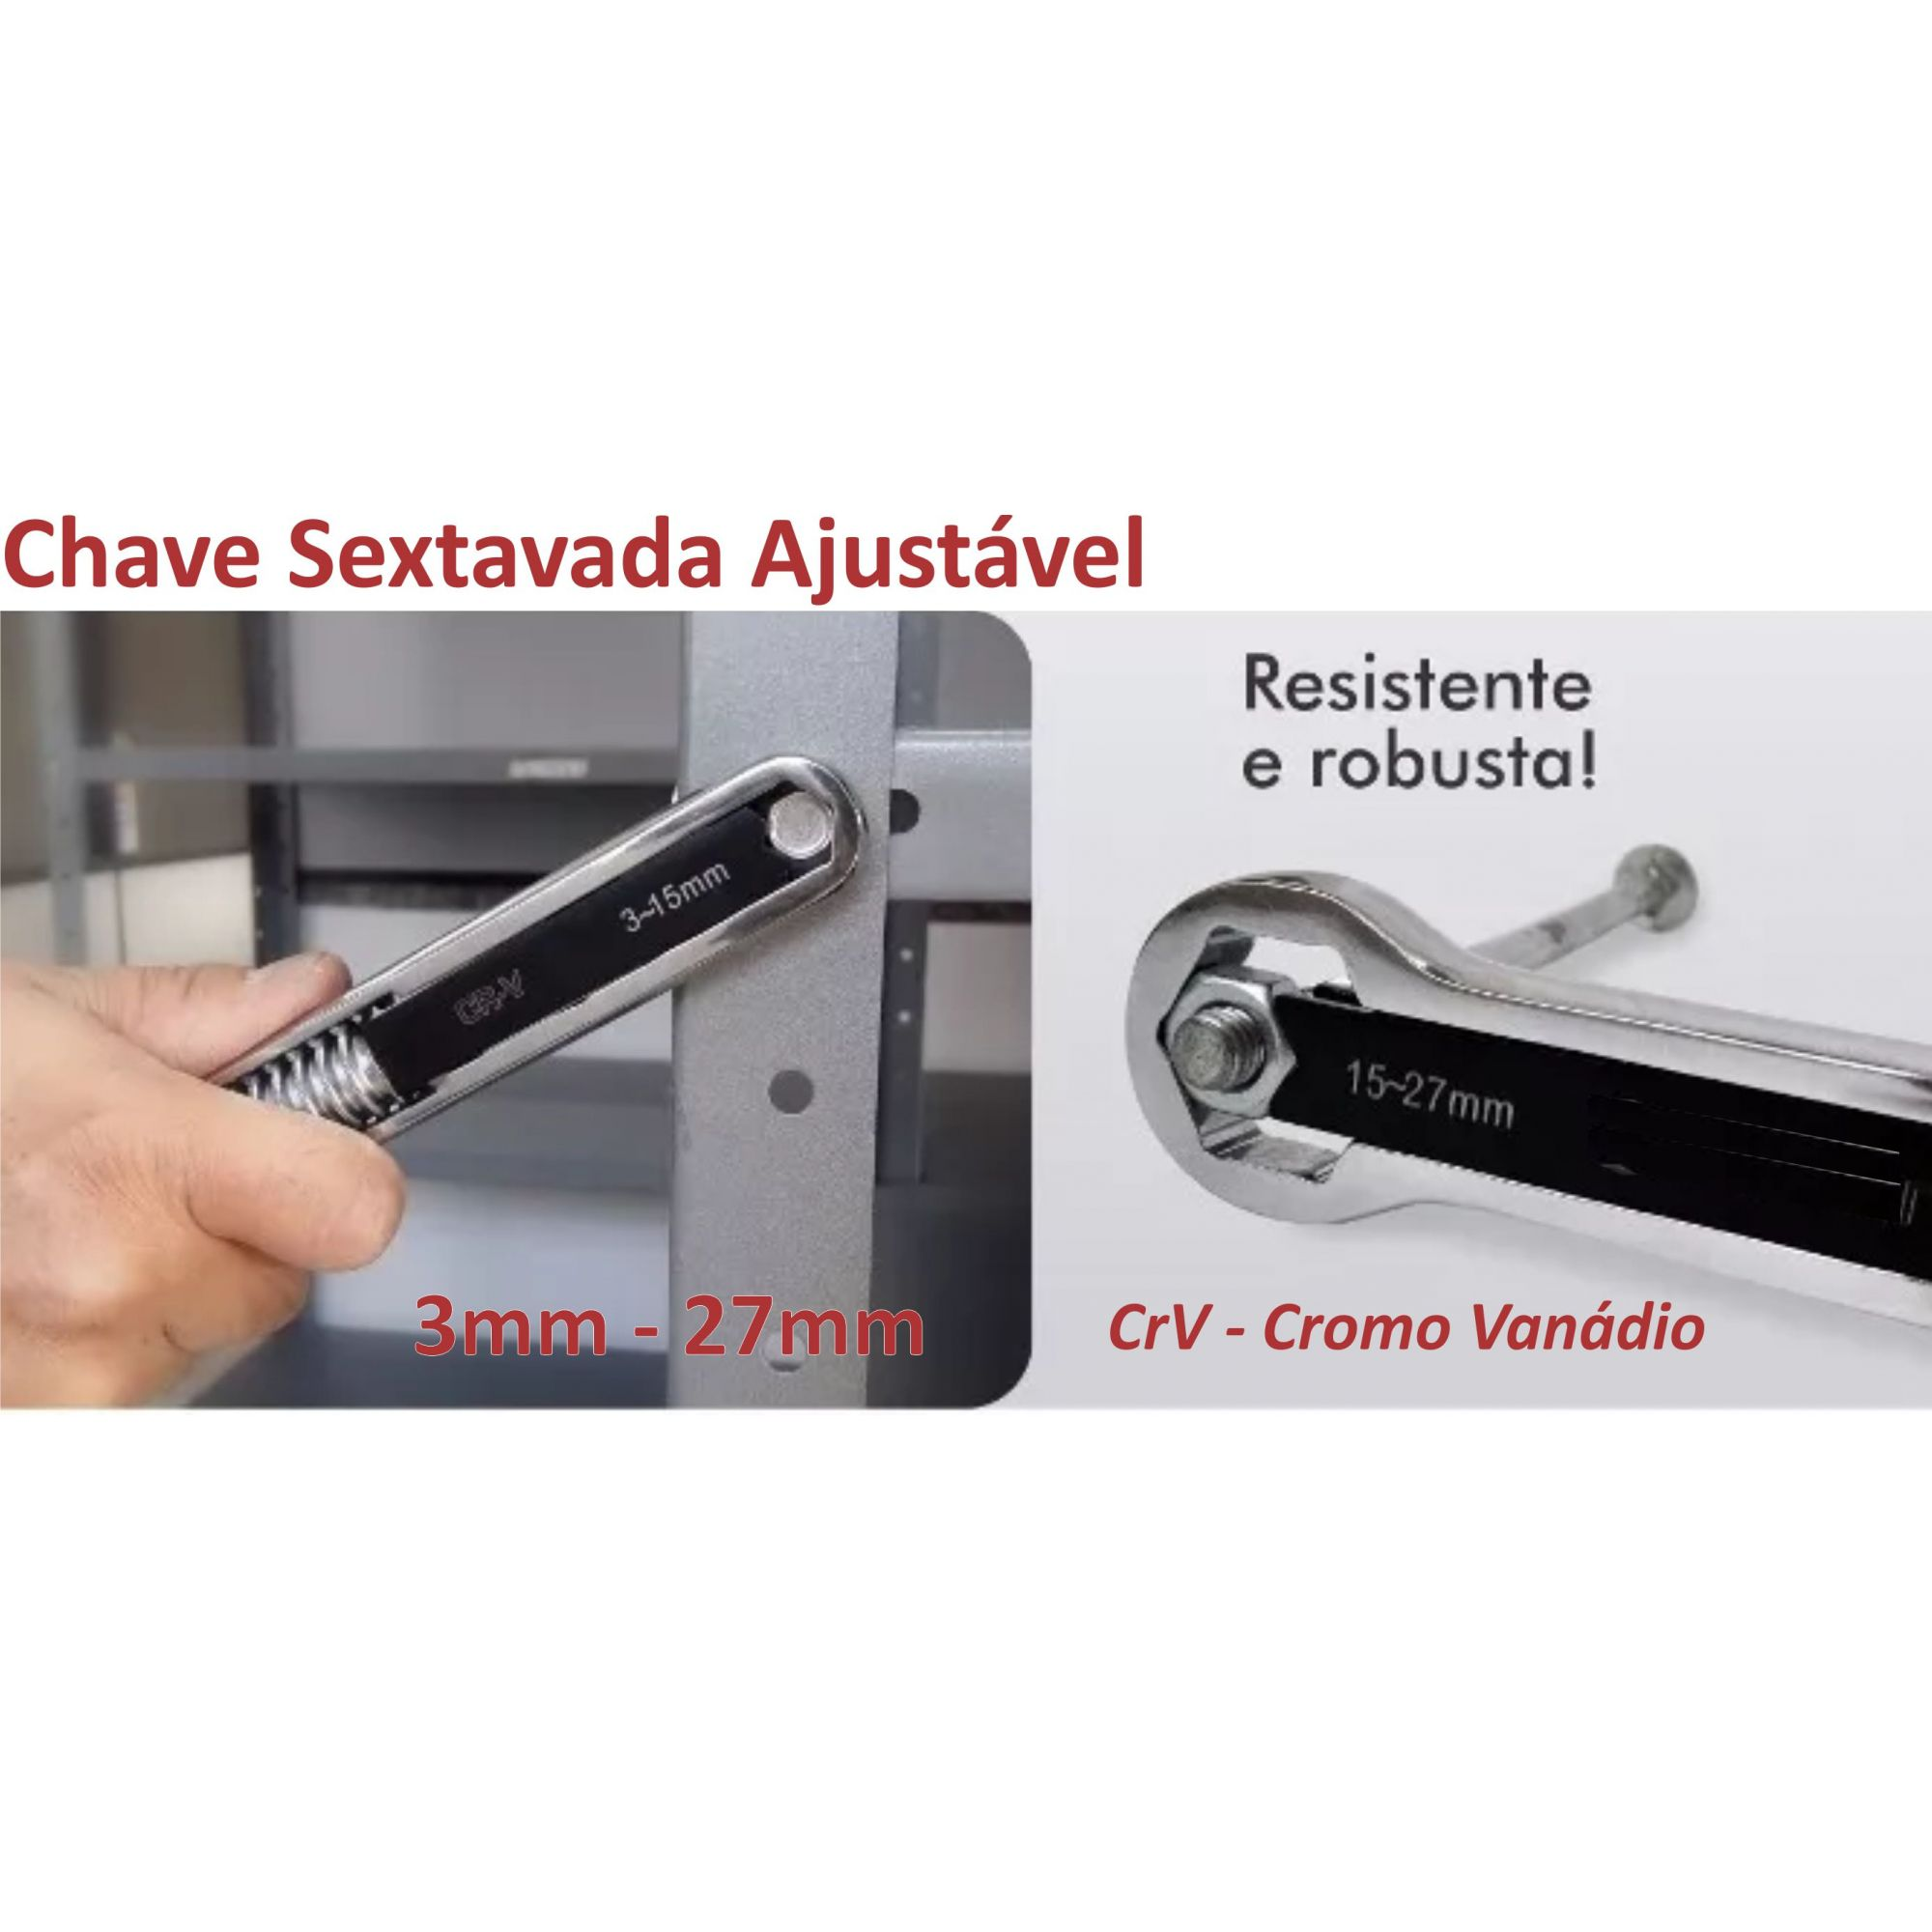 Chave Sextavada Ajustavel de 5-27mm